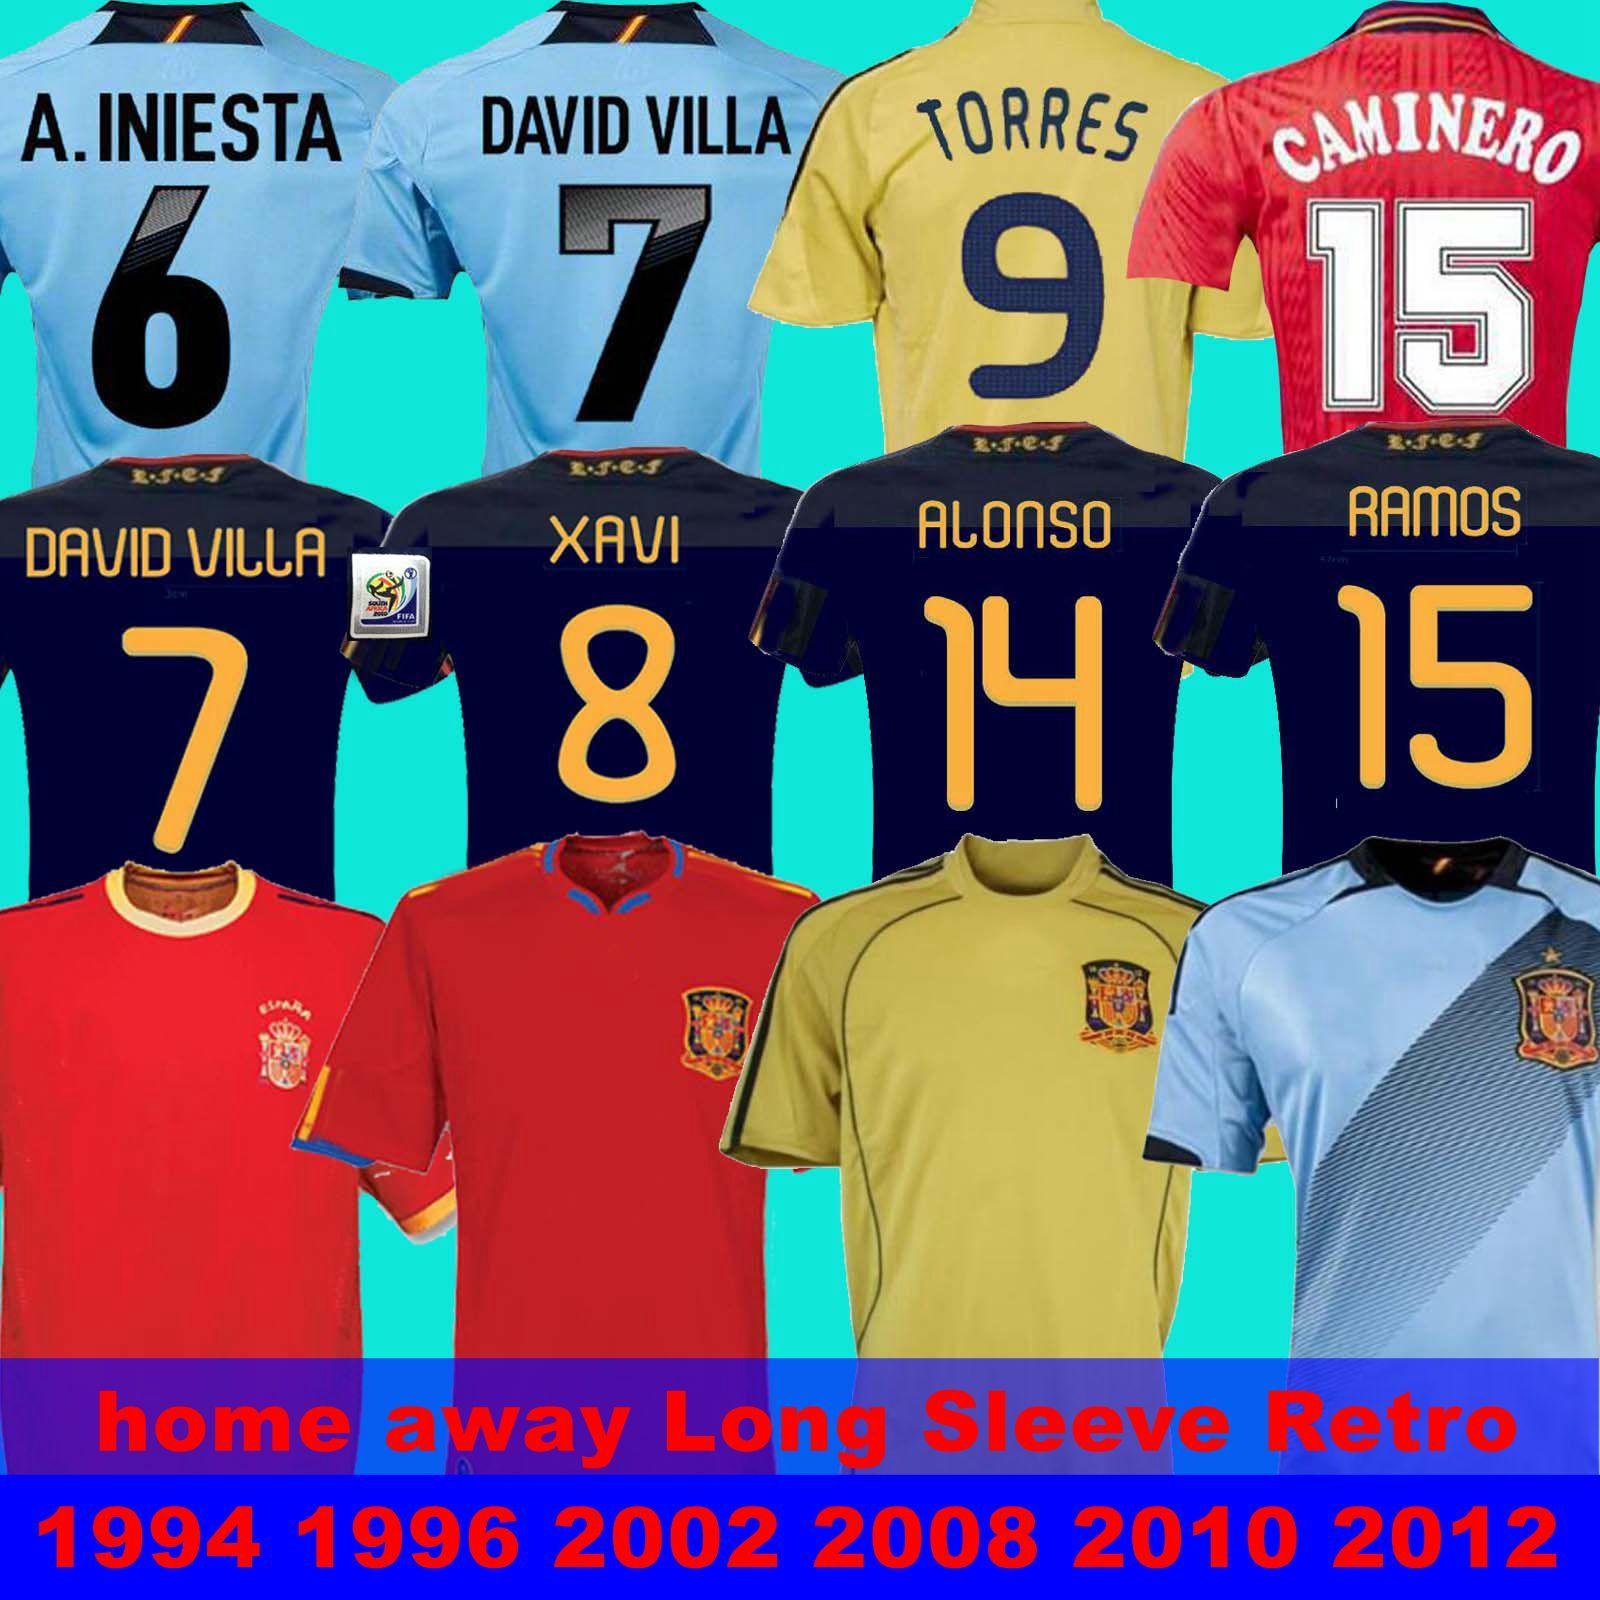 final 2010 Spain retro jersey 1994 1996 2002 2008 2012 Spain RAUL XAVI LUIS ENSRIQUE ALONSO Spain Player Long Sleeve Retro DAVAD David Villa